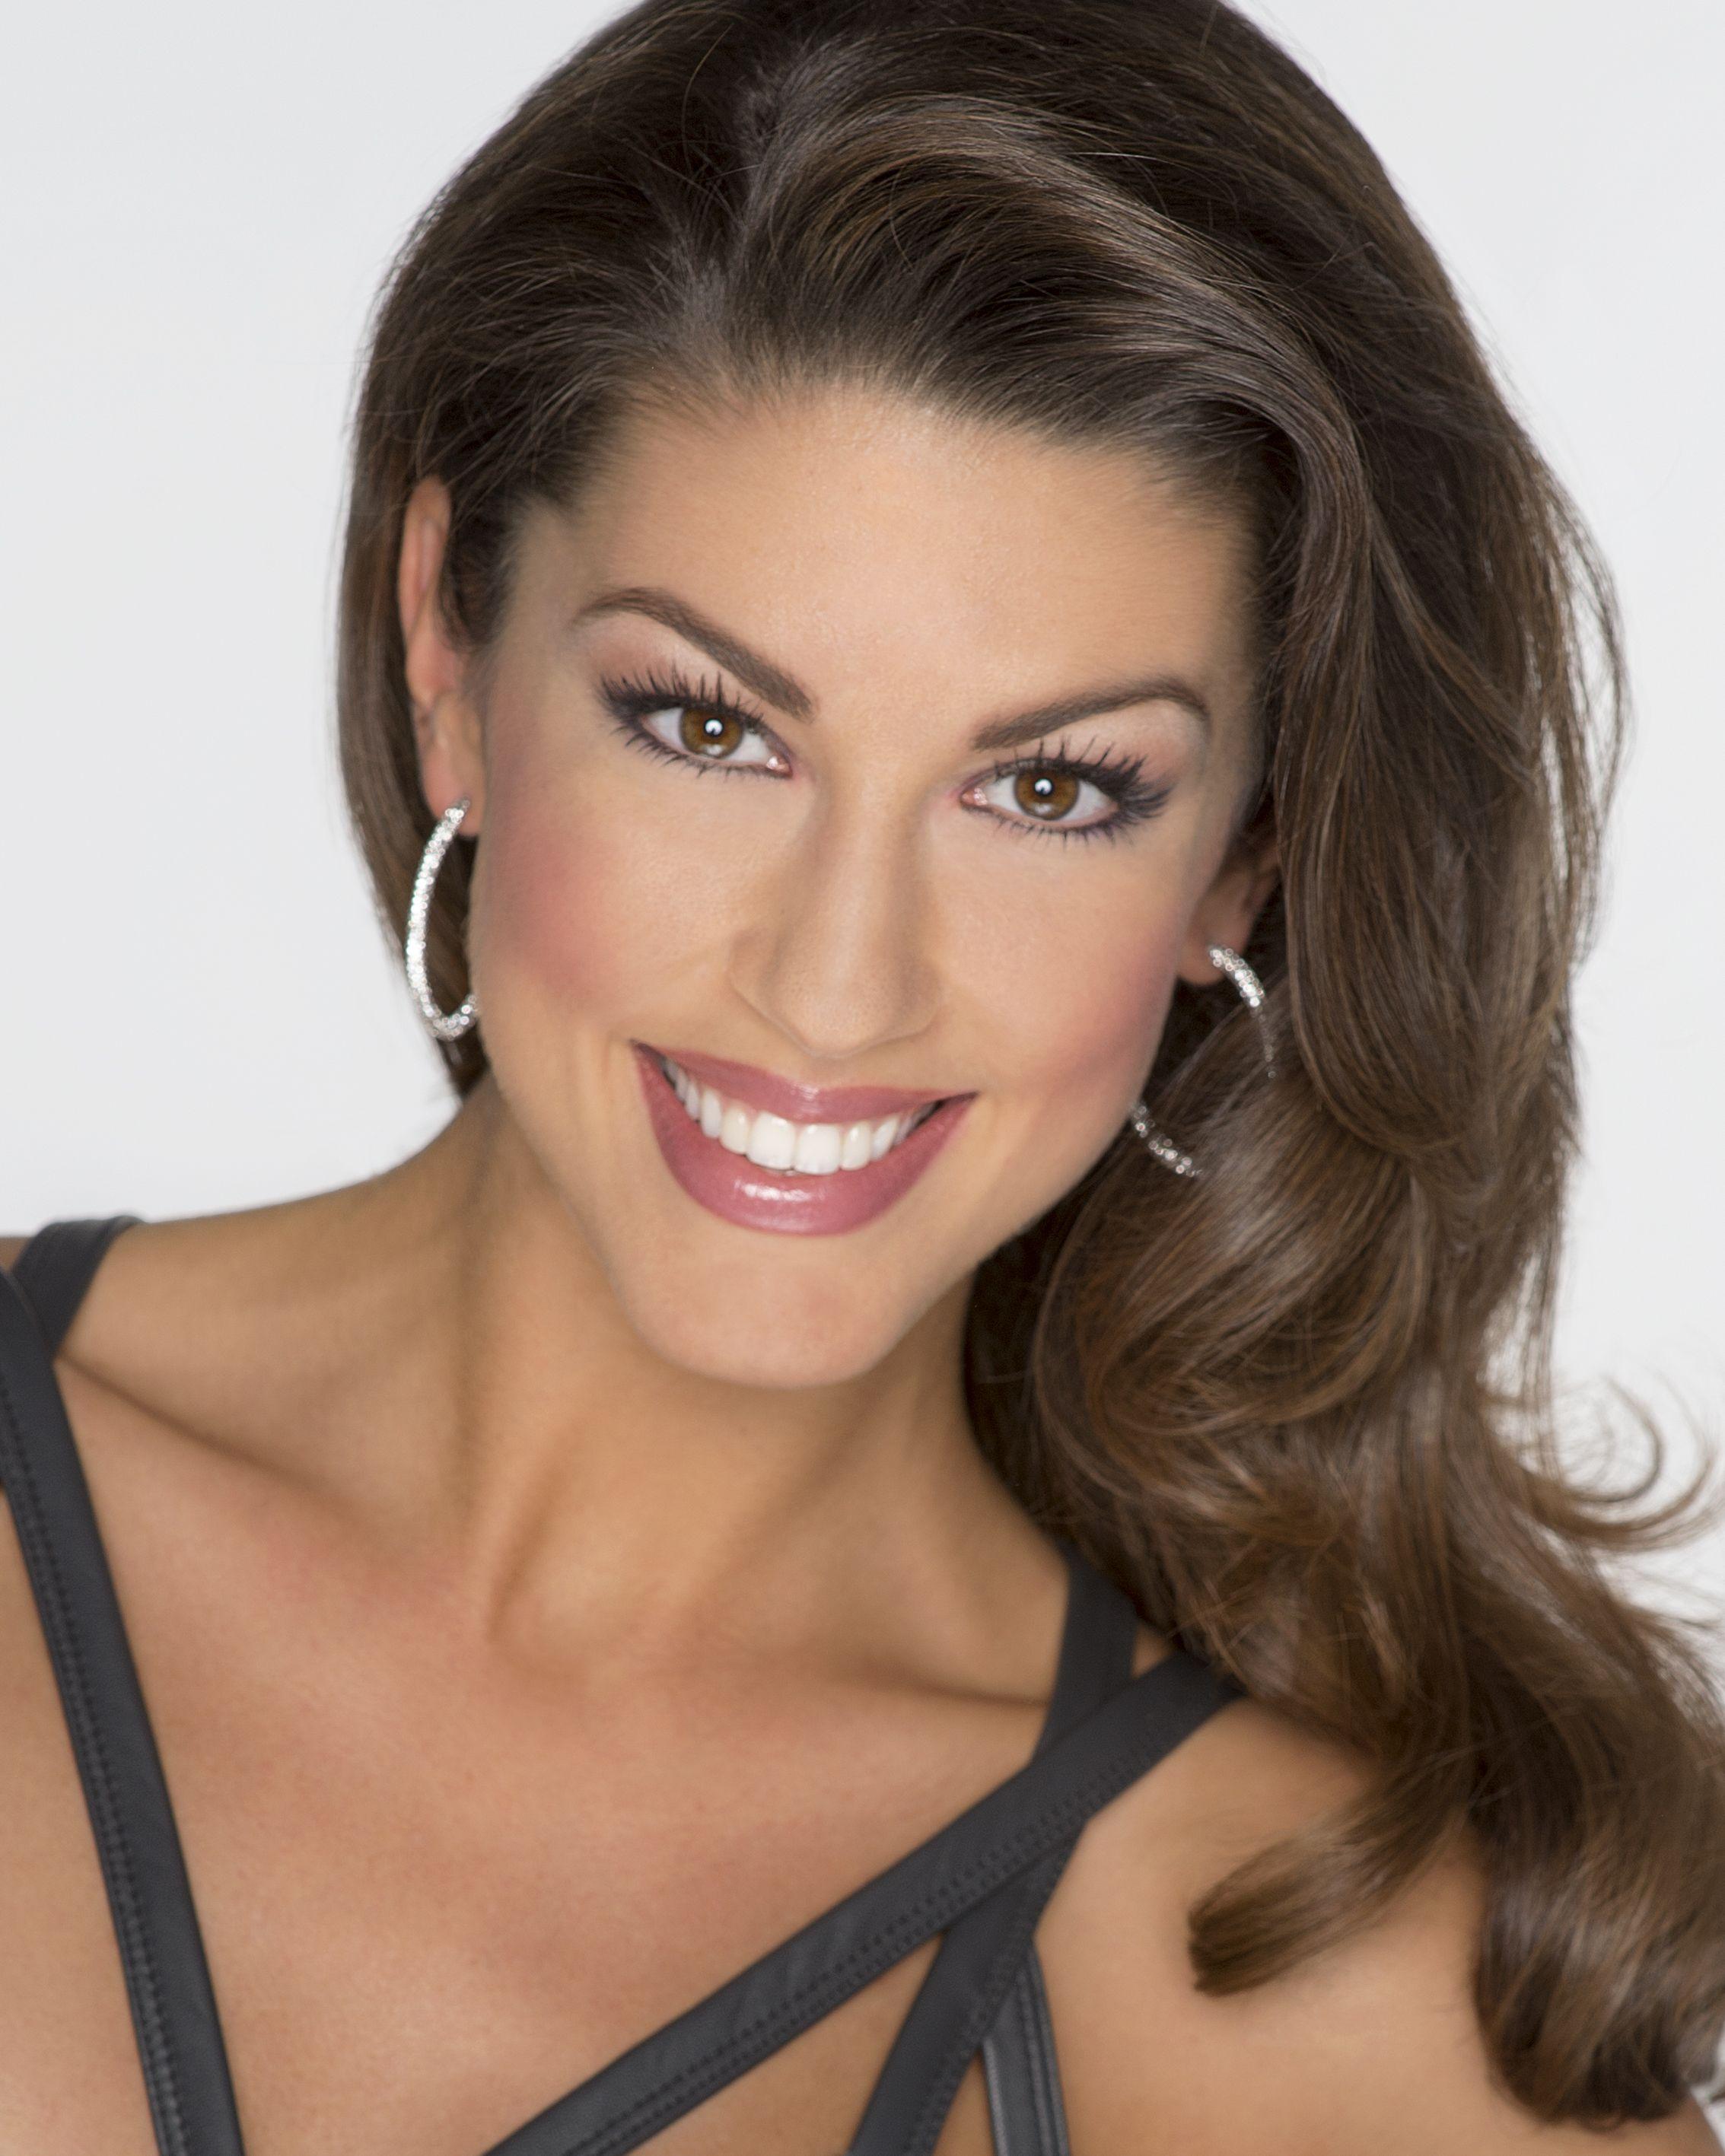 Miss Oklahoma 2014 Alex Eppler